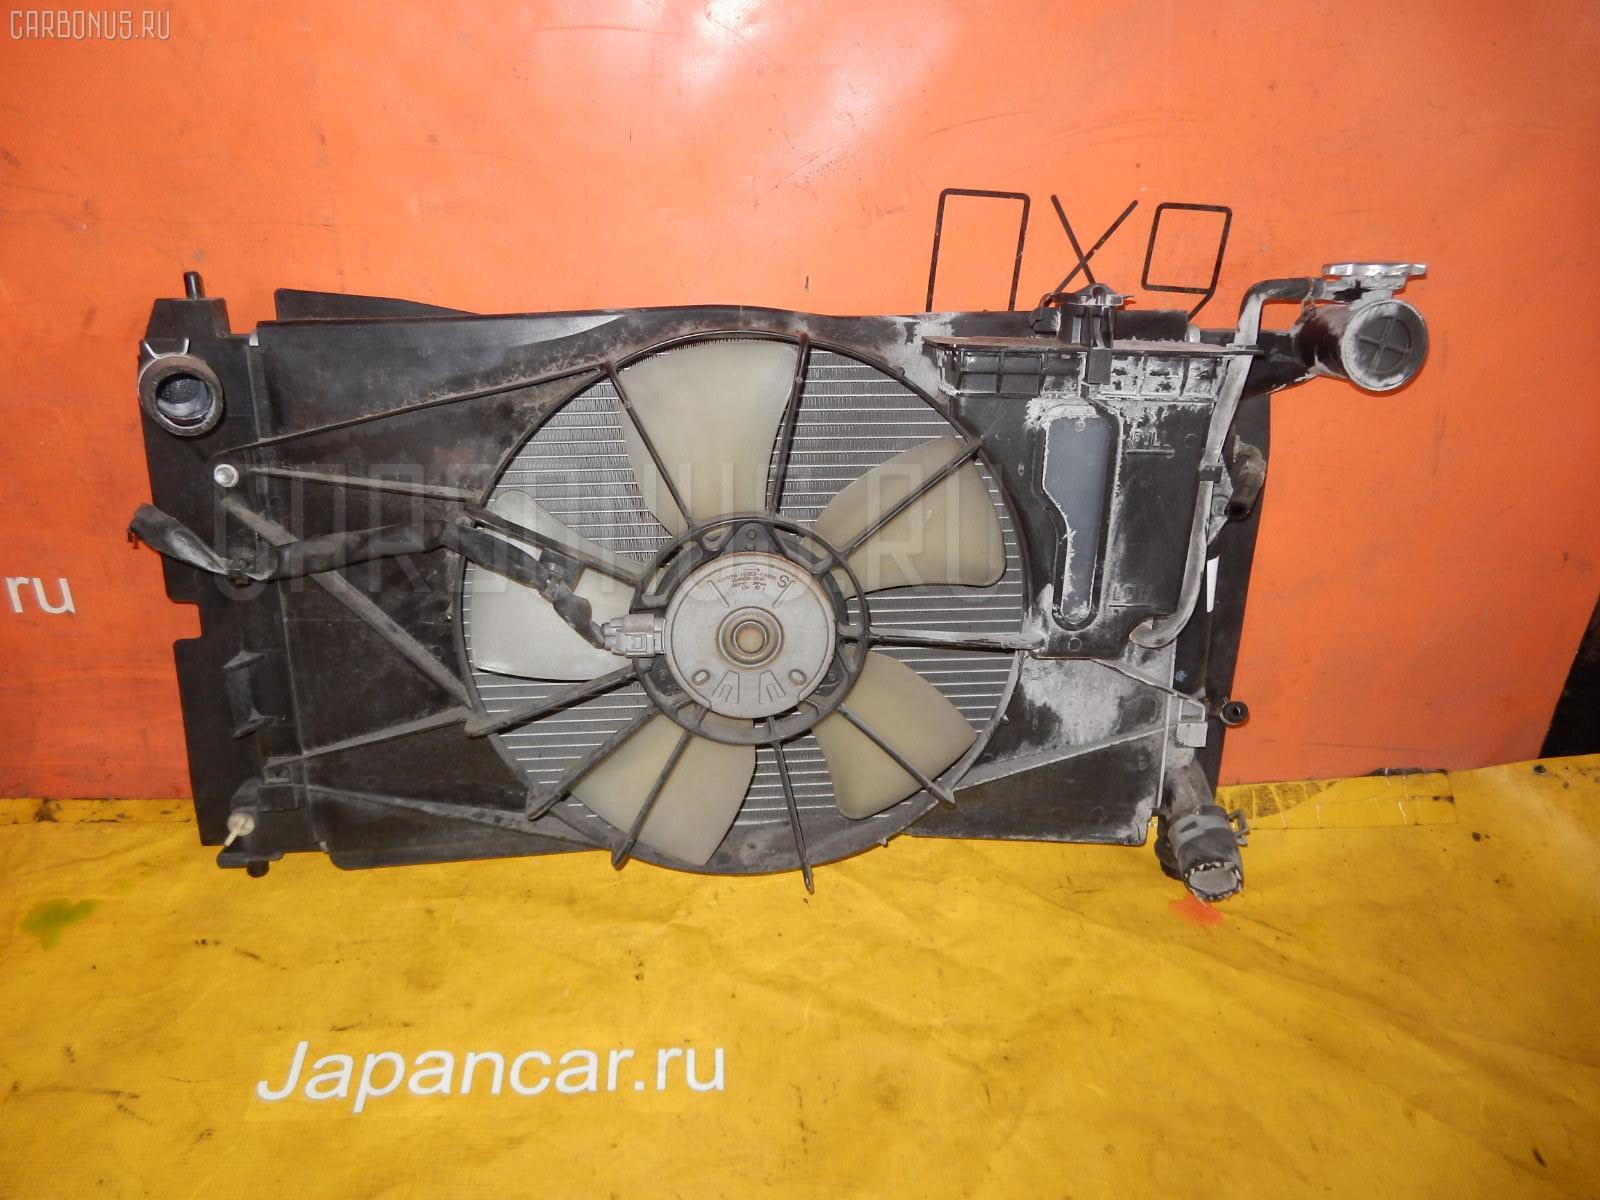 Радиатор ДВС TOYOTA COROLLA SPACIO NZE121N 1NZ-FE. Фото 9